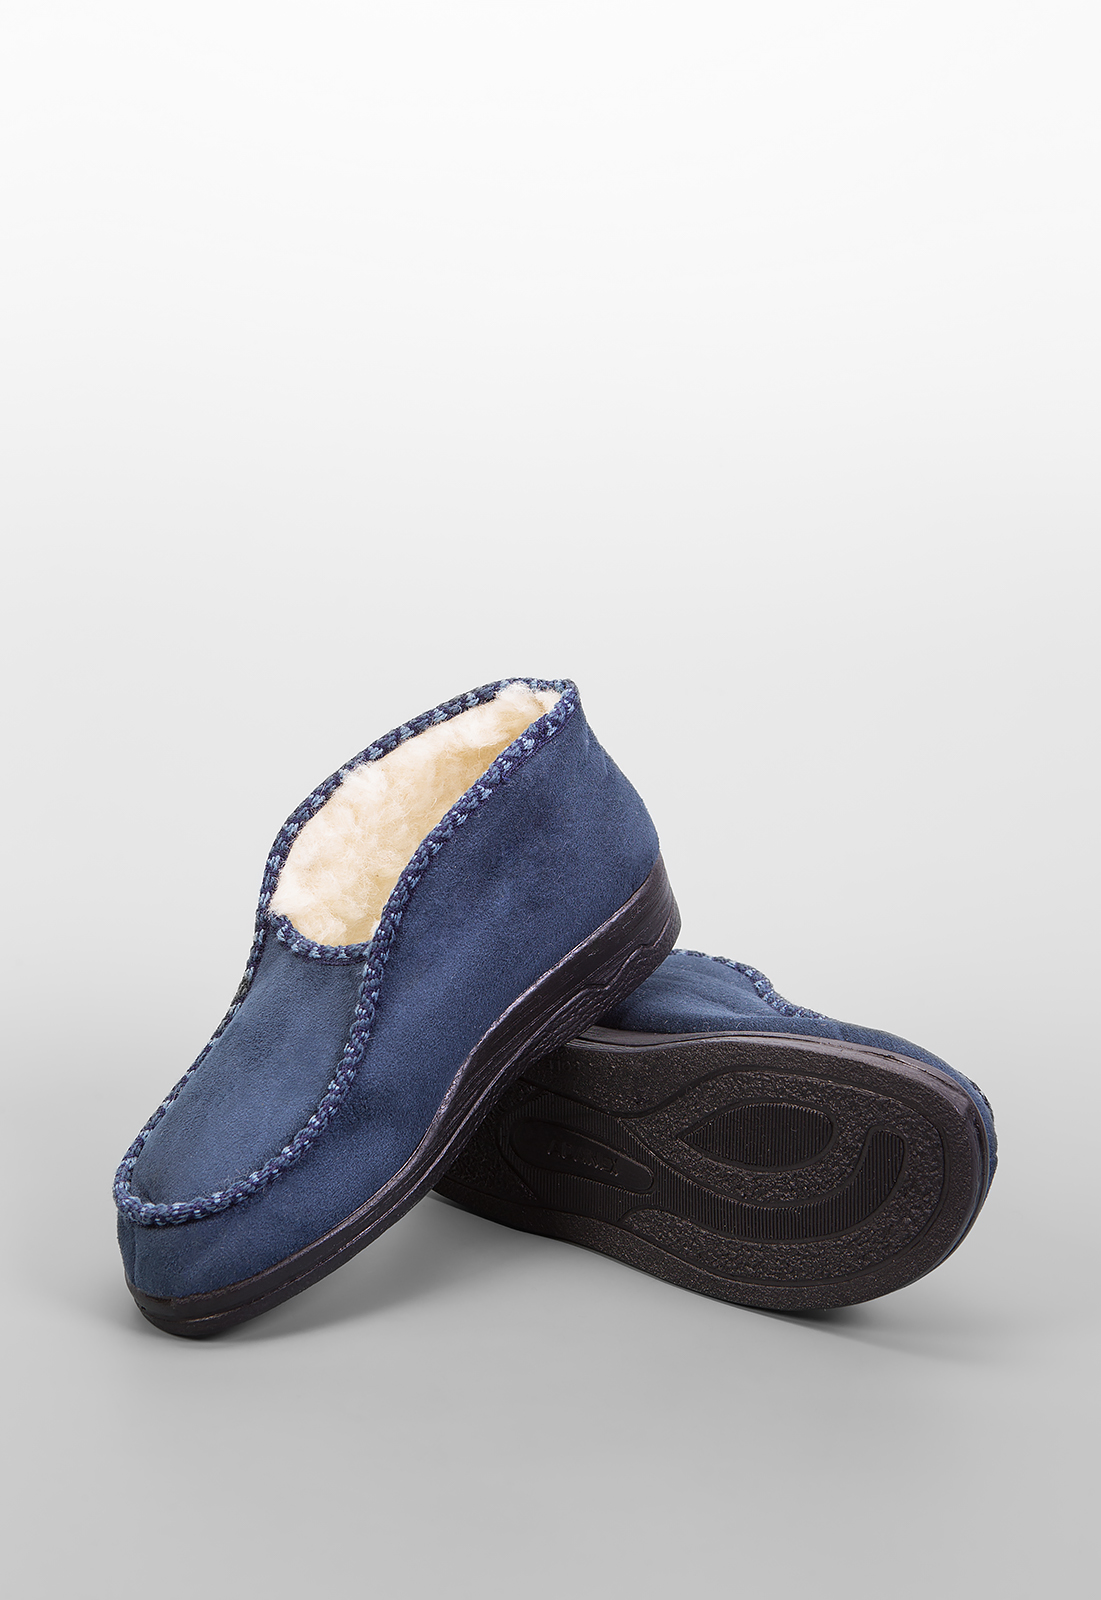 Домашние тапочки женские Anex 16001 синие 39 RU